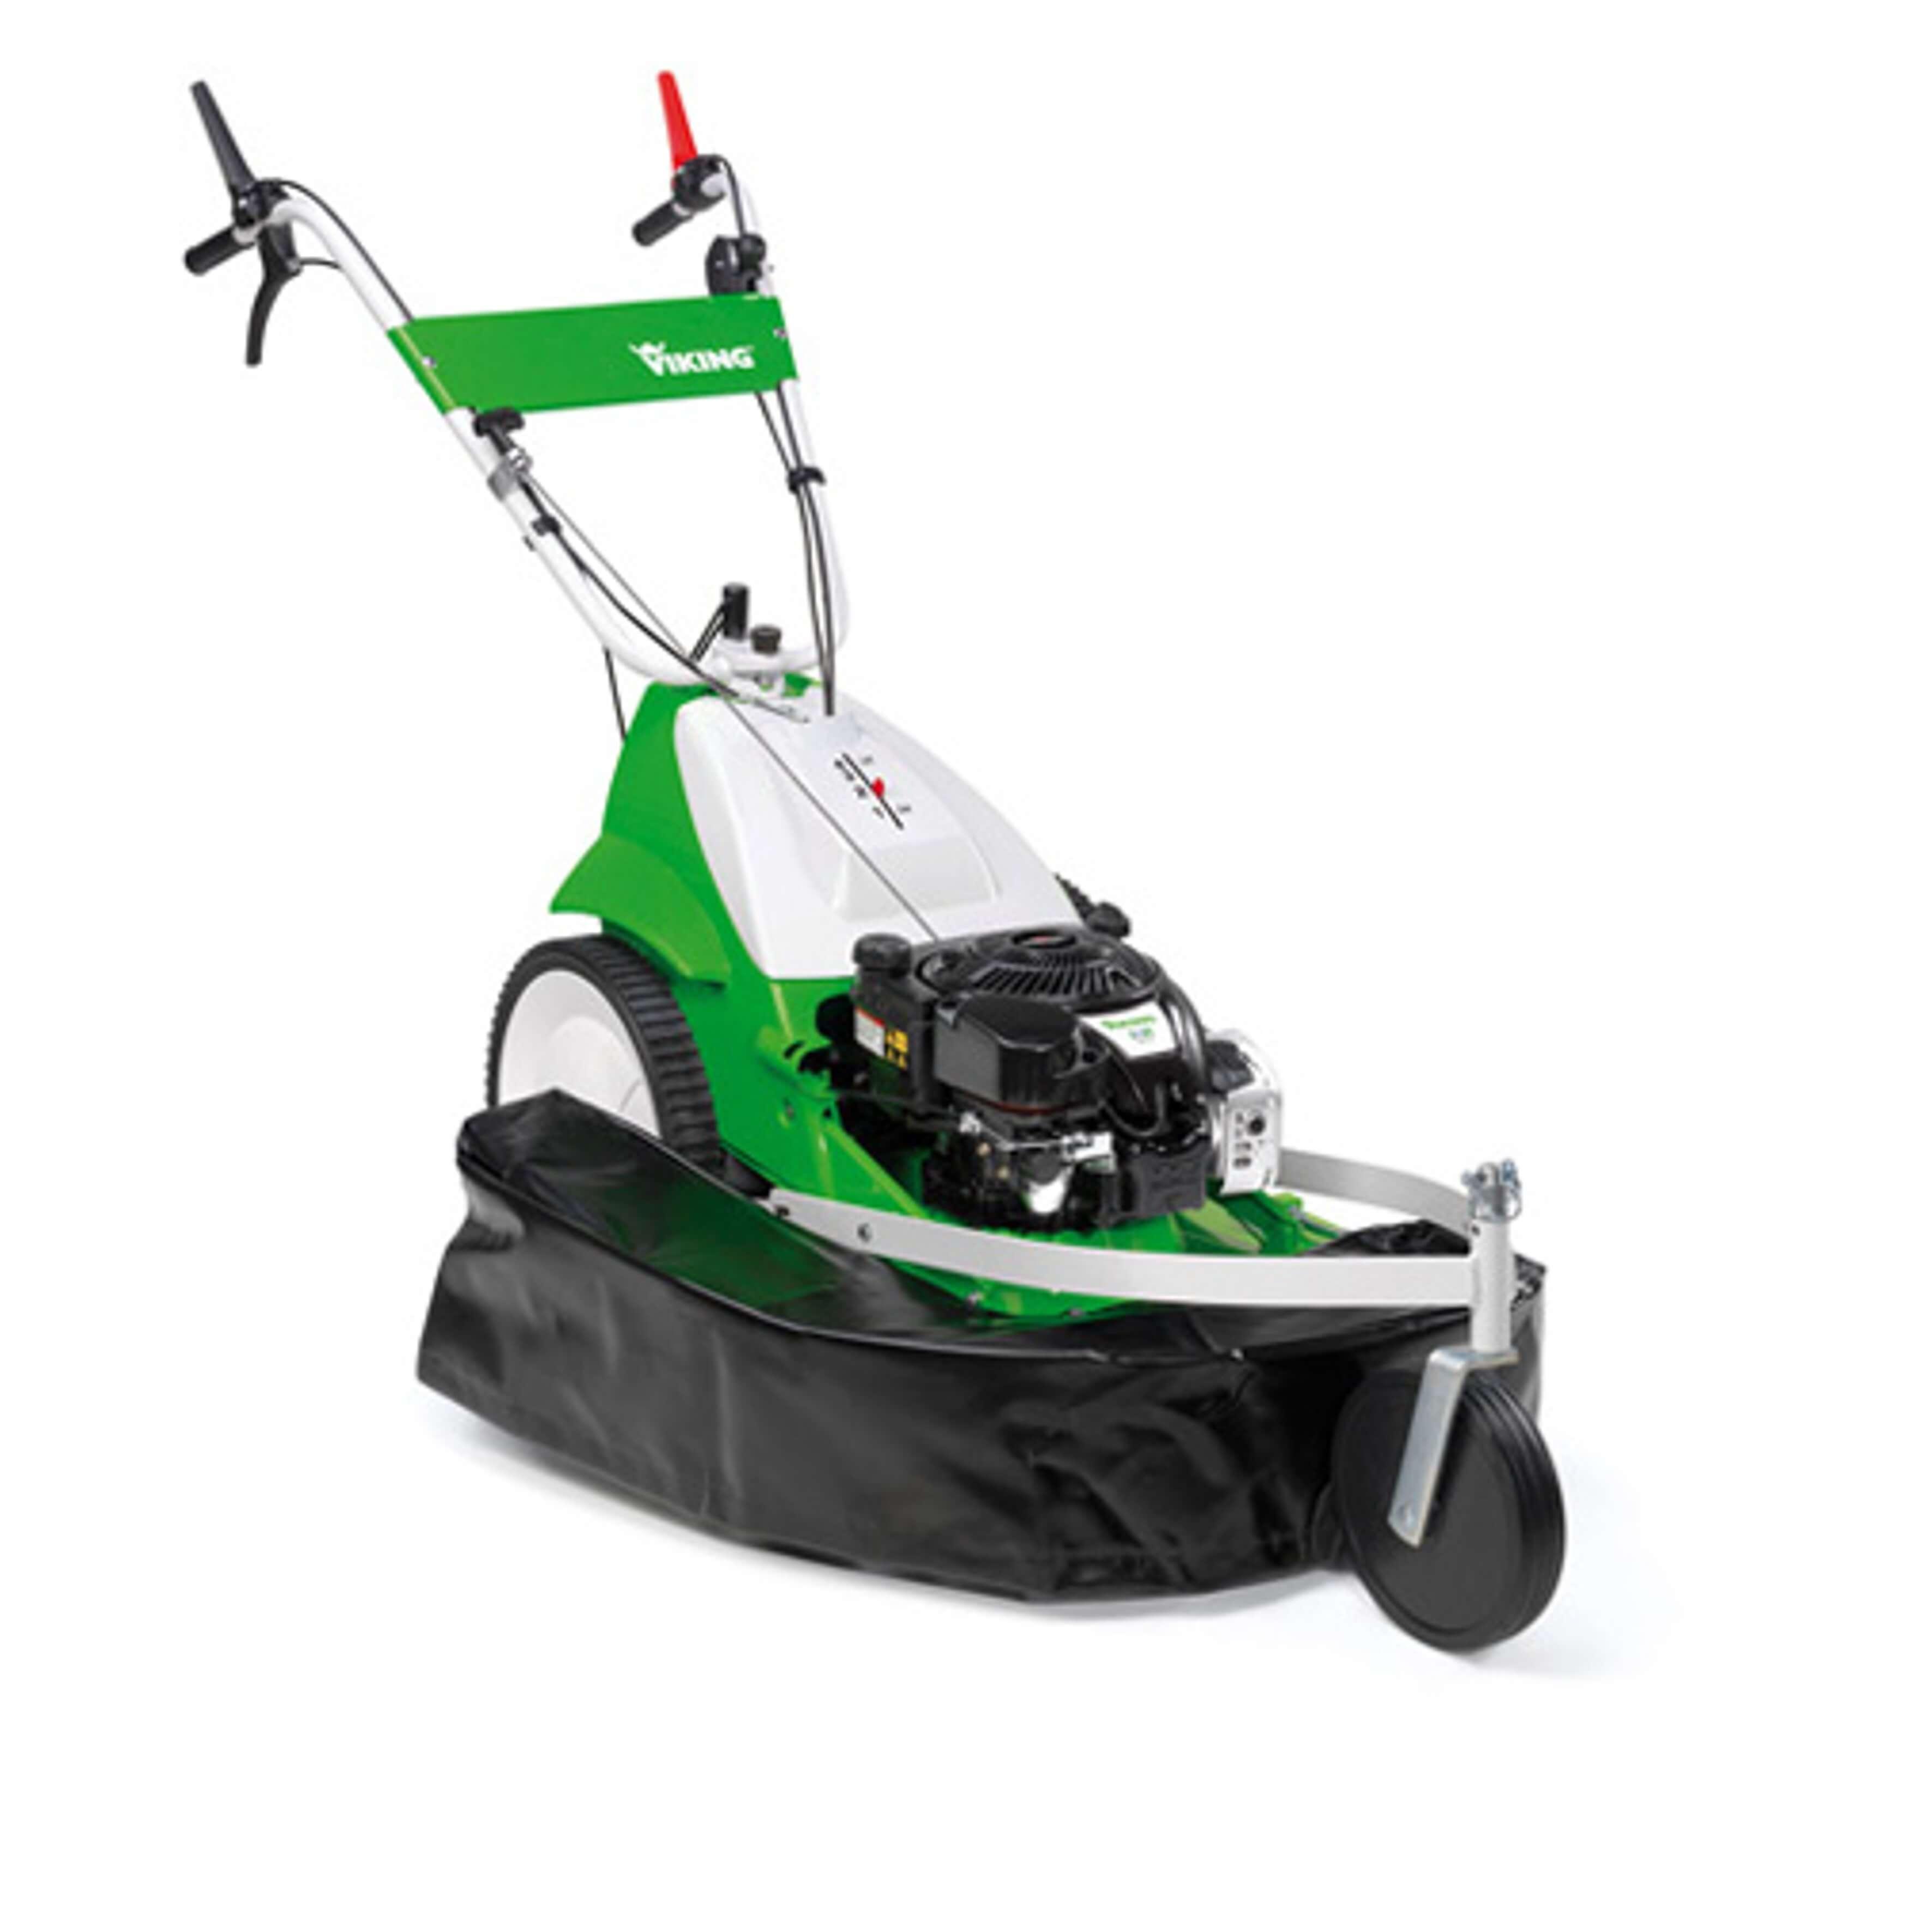 Viking MB 6.1 RH Petrol Lawn Mowers